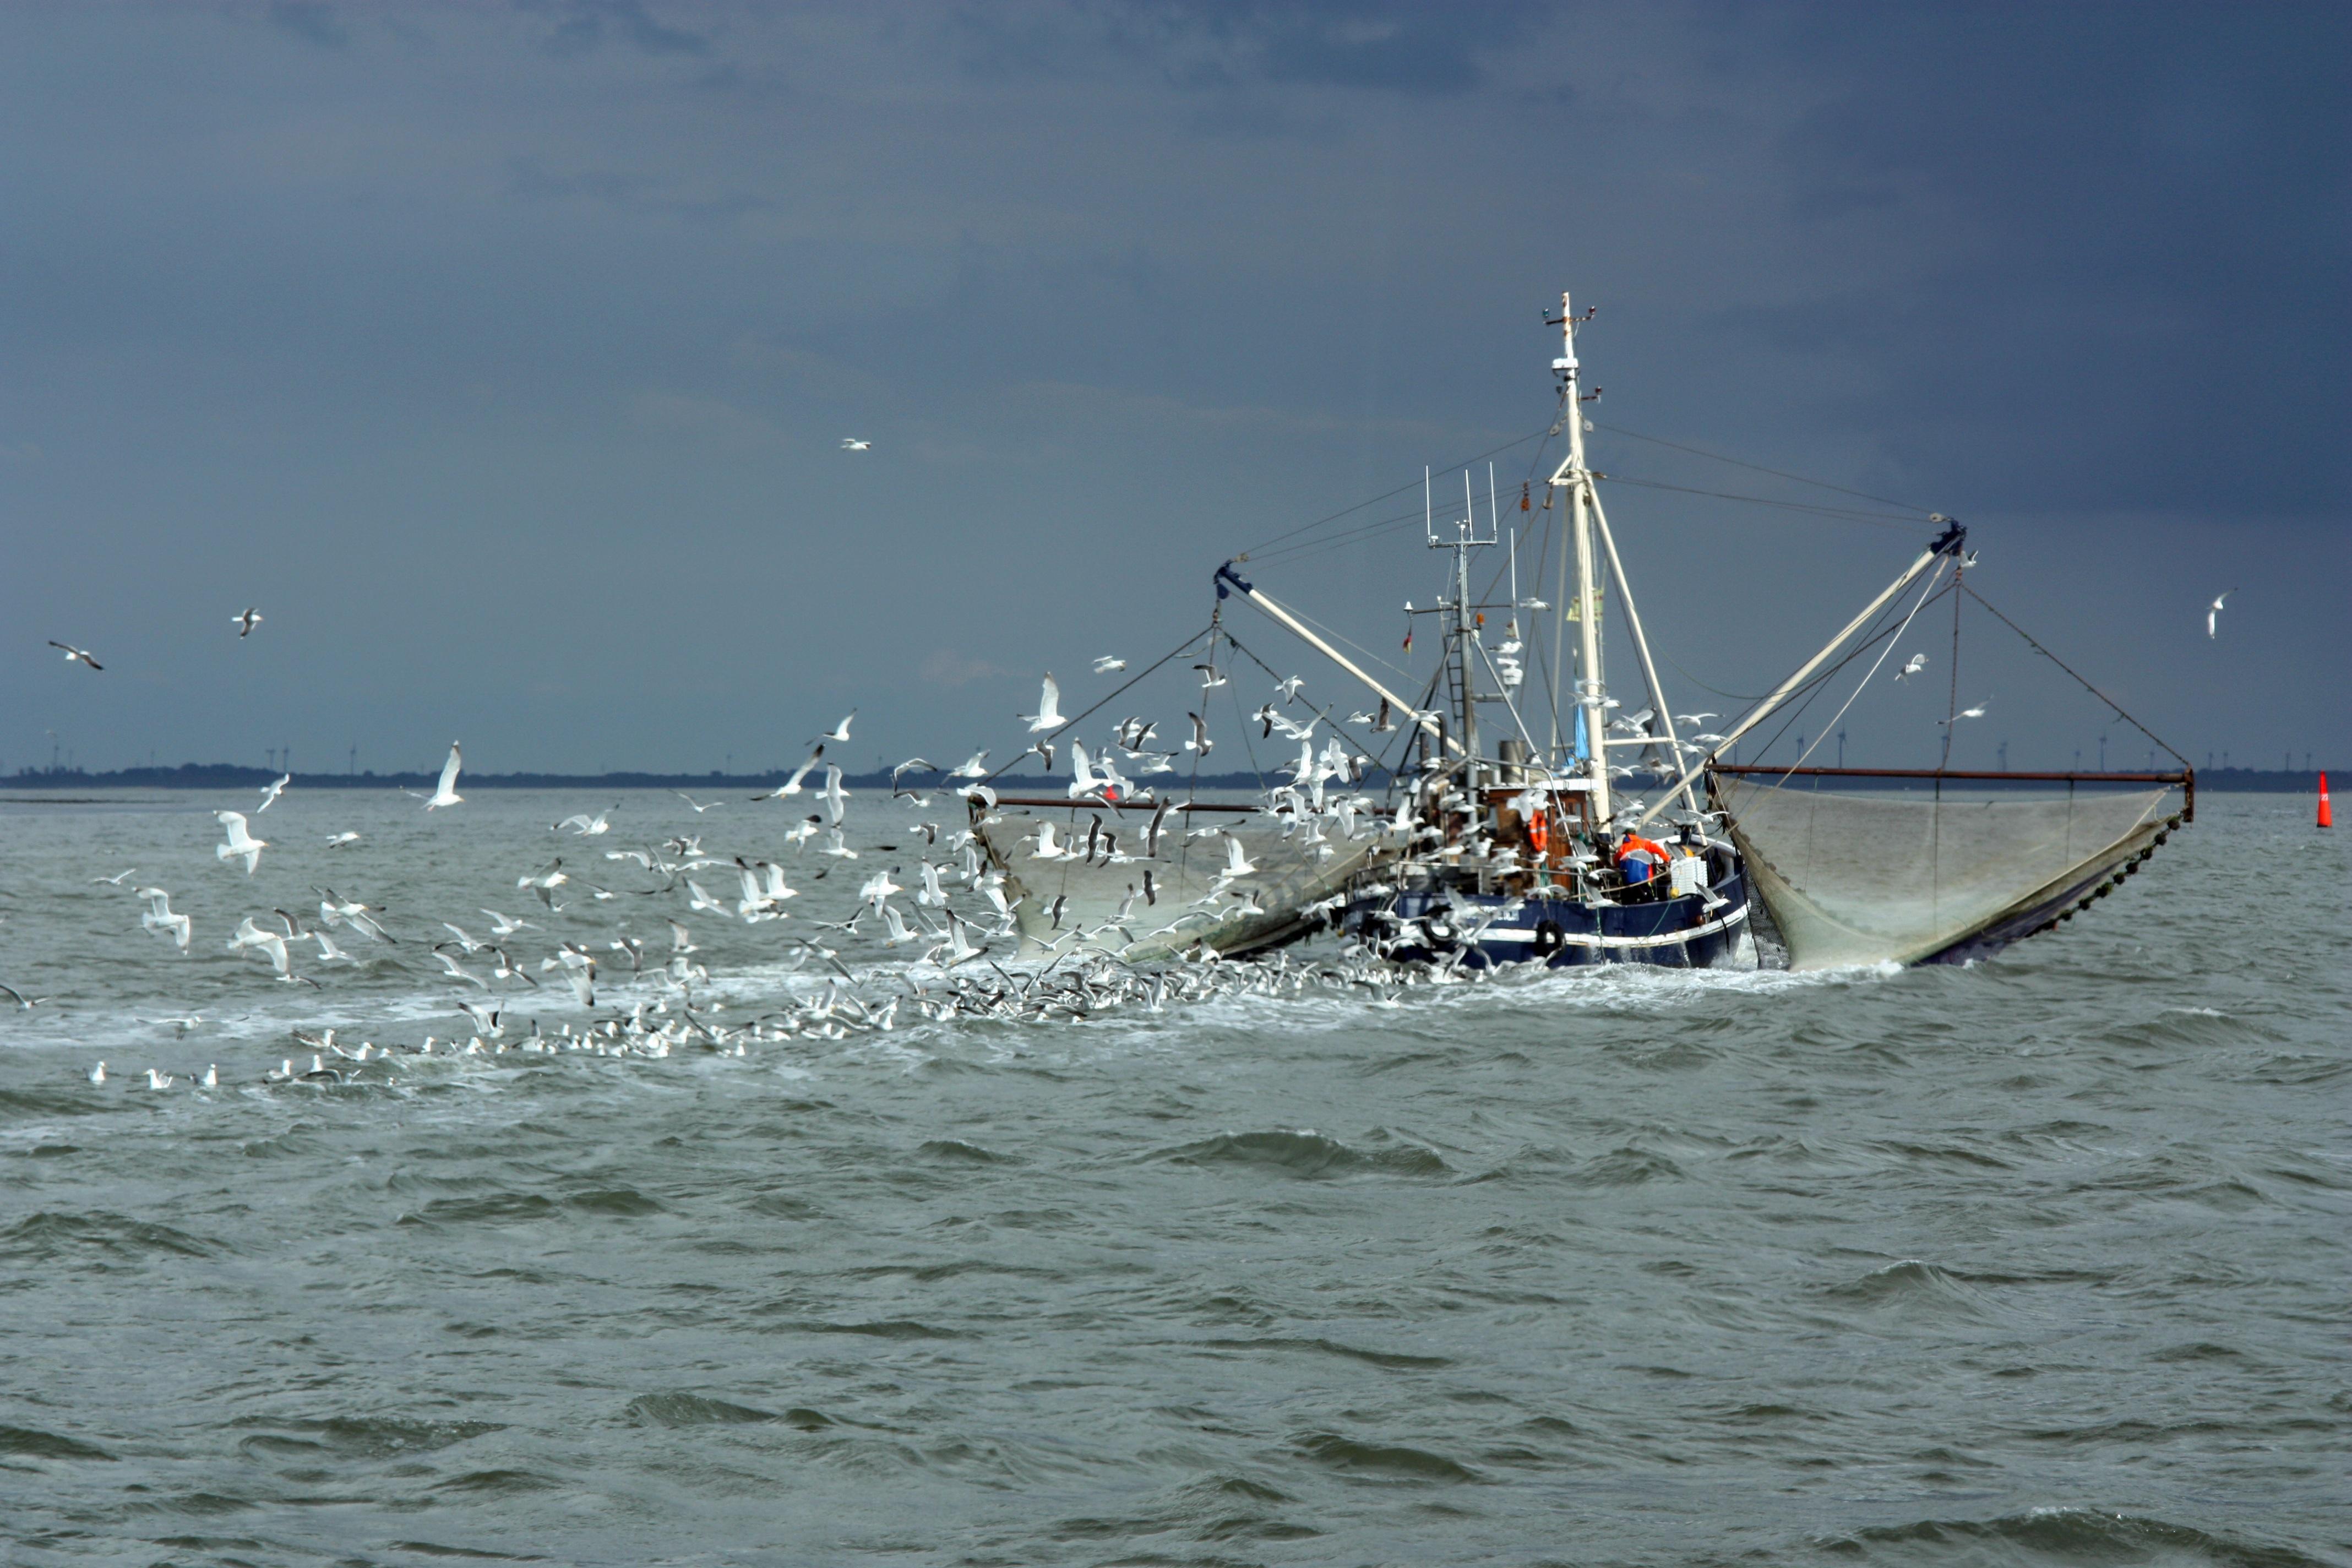 гранола картинки судно рыба картины ломают